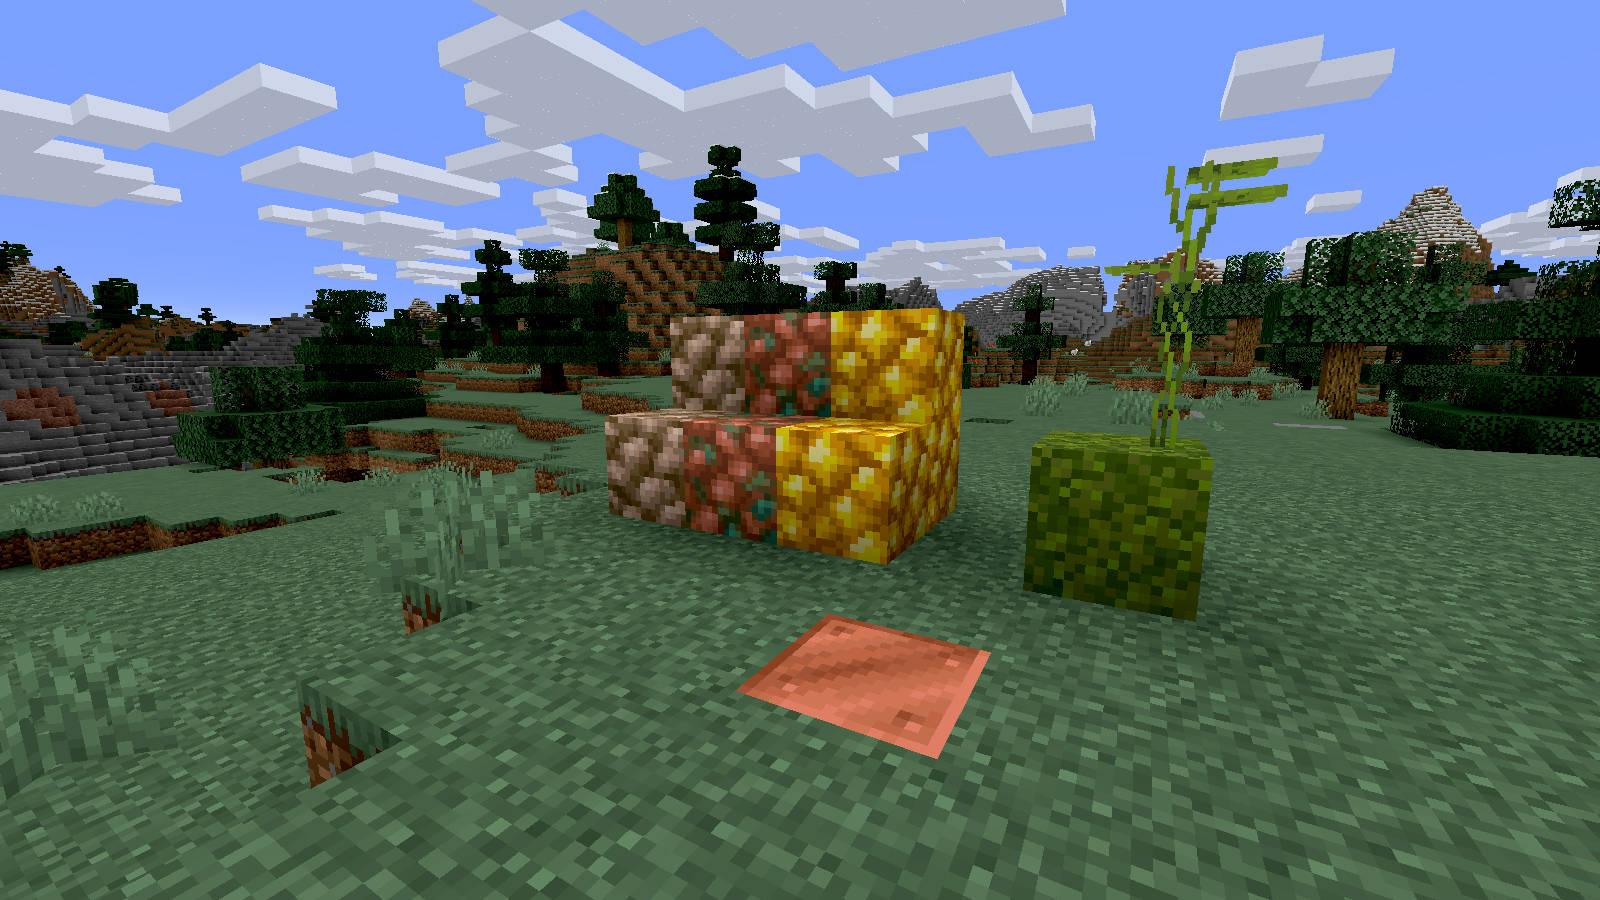 minecraft snapshot tekstury rudy